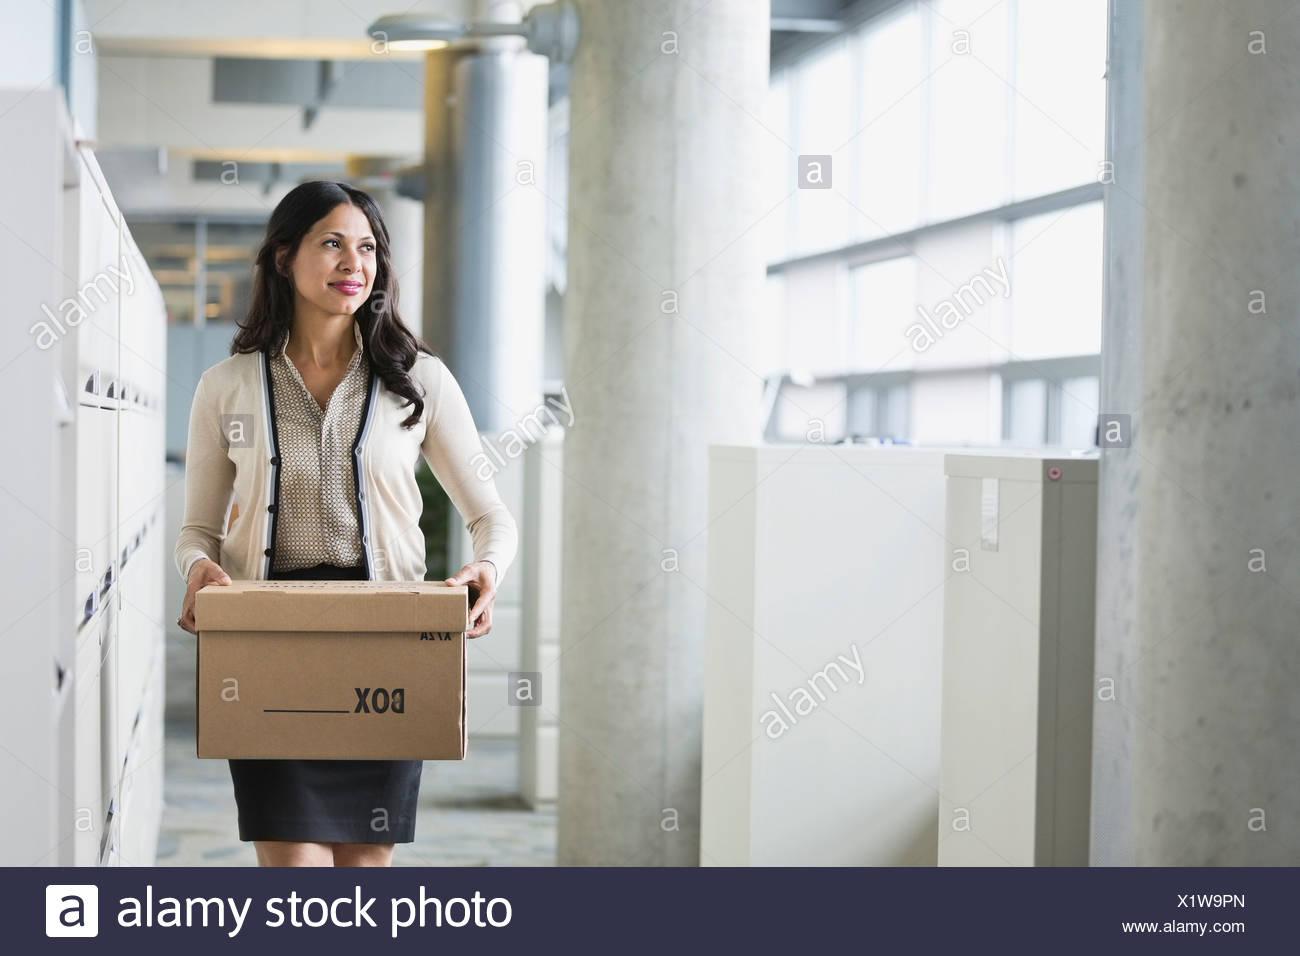 Businesswoman carrying cardboard box - Stock Image